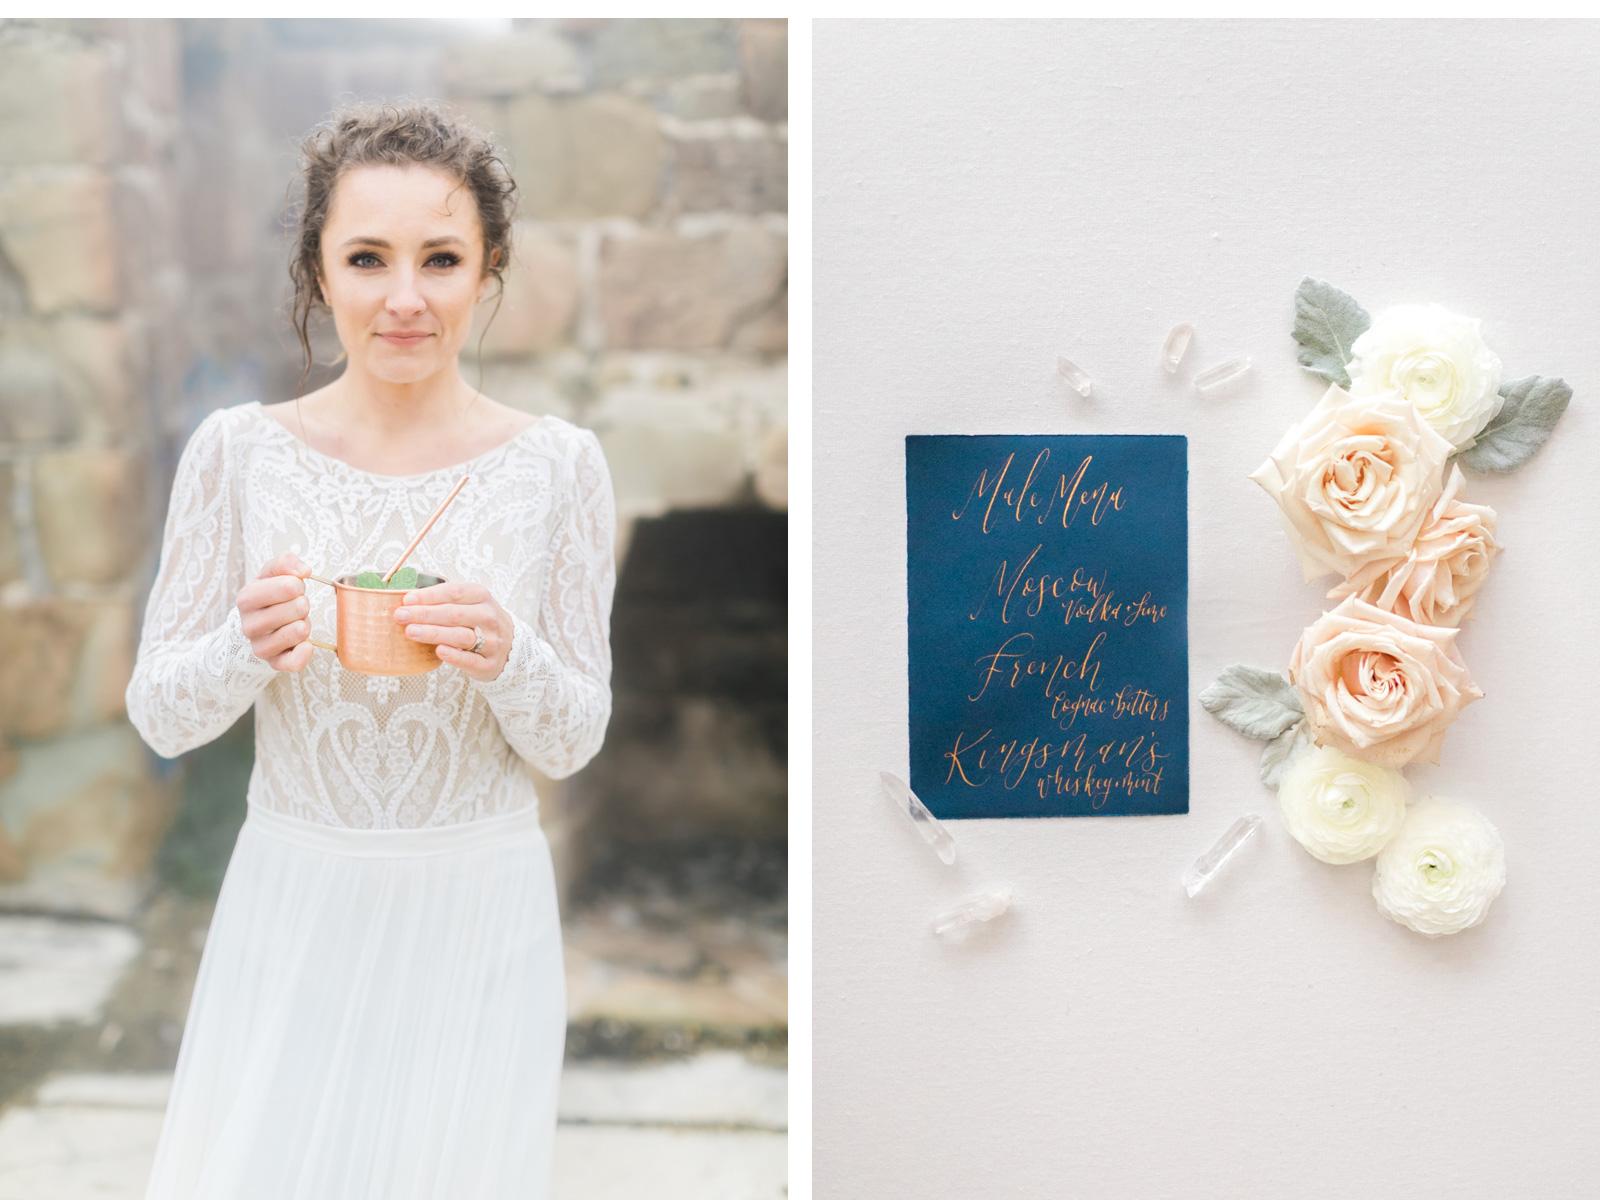 Santa-Barbara-Wedding-Style-Me-Pretty-Natalie-Schutt-Photography_10.jpg